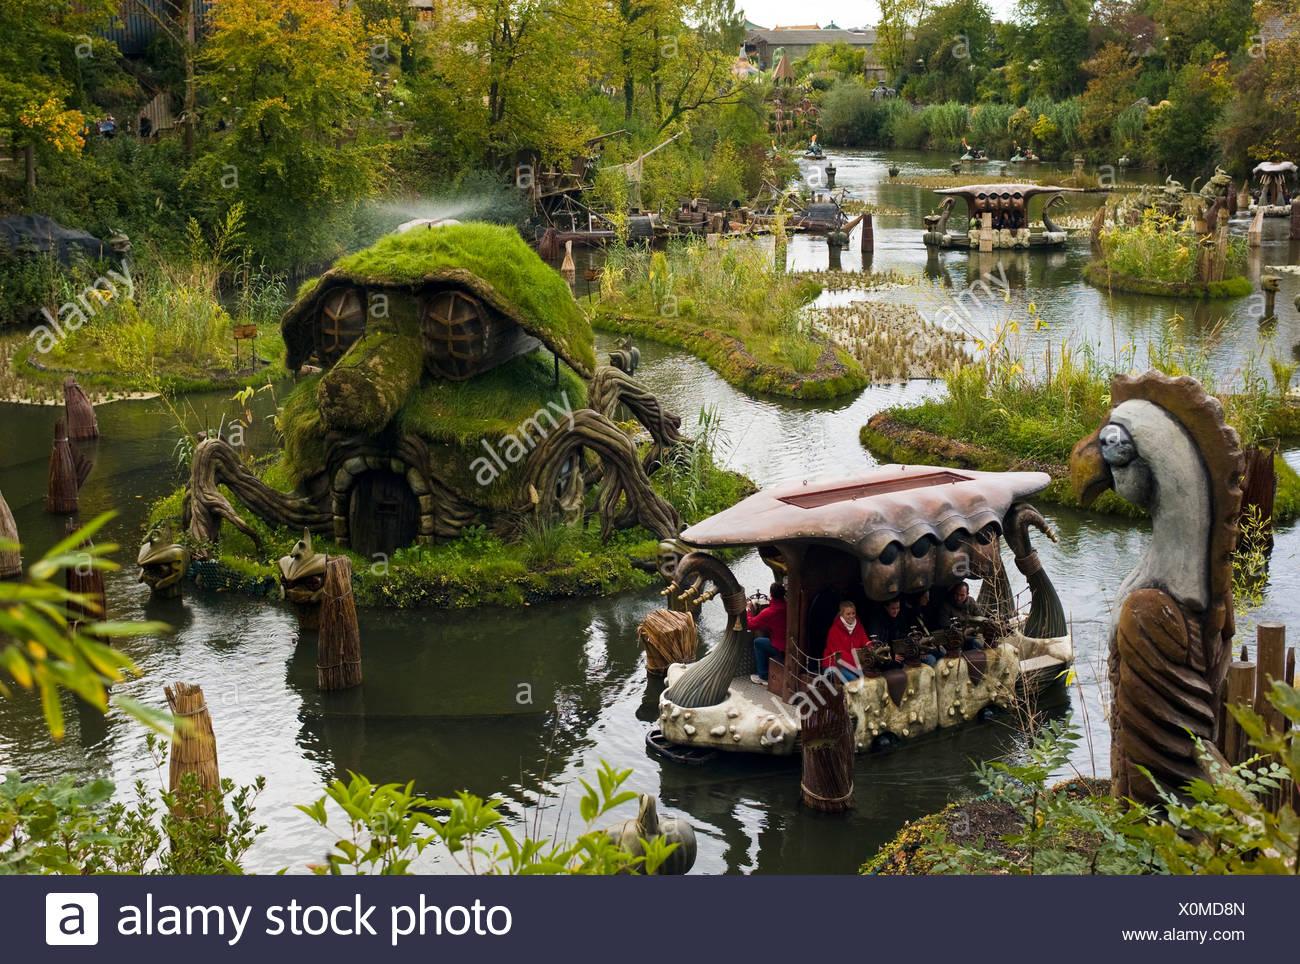 Phantasialand, amusement park, theme park Fantasy, attraction WAKOBATO, Bruehl, Nordrhein-Westfalen, Germany, Europe - Stock Image